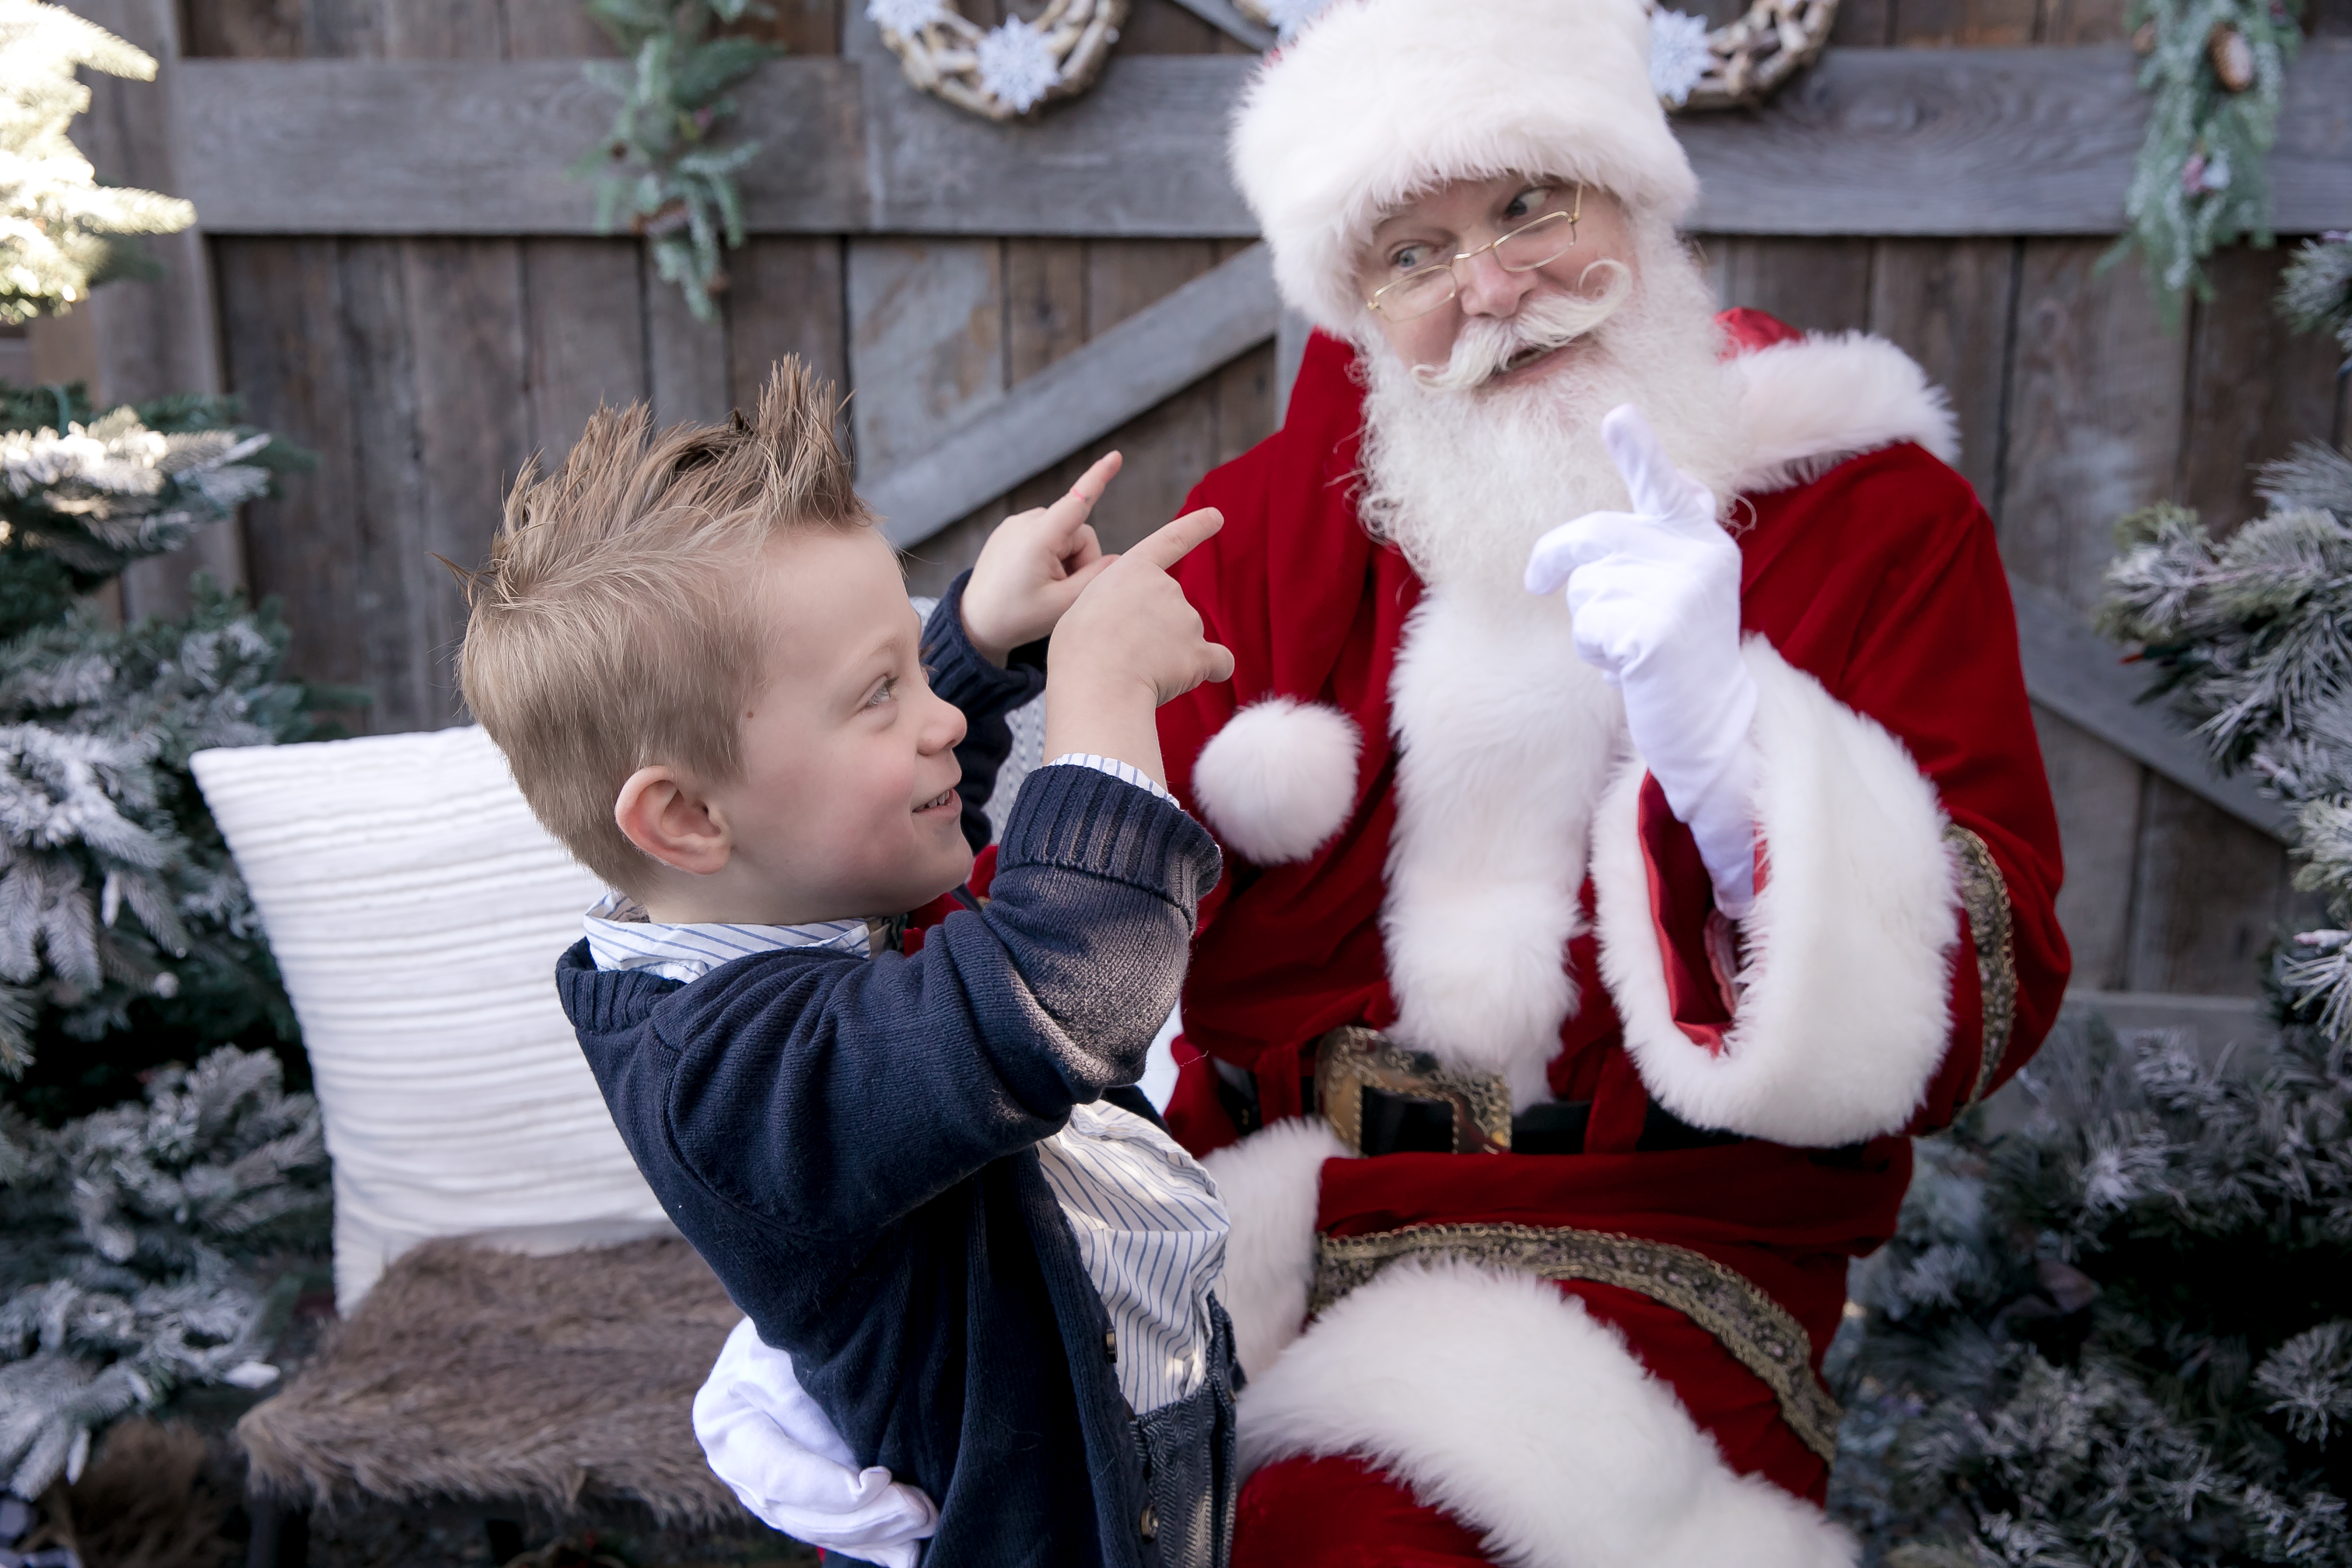 Seattle Santa Claus